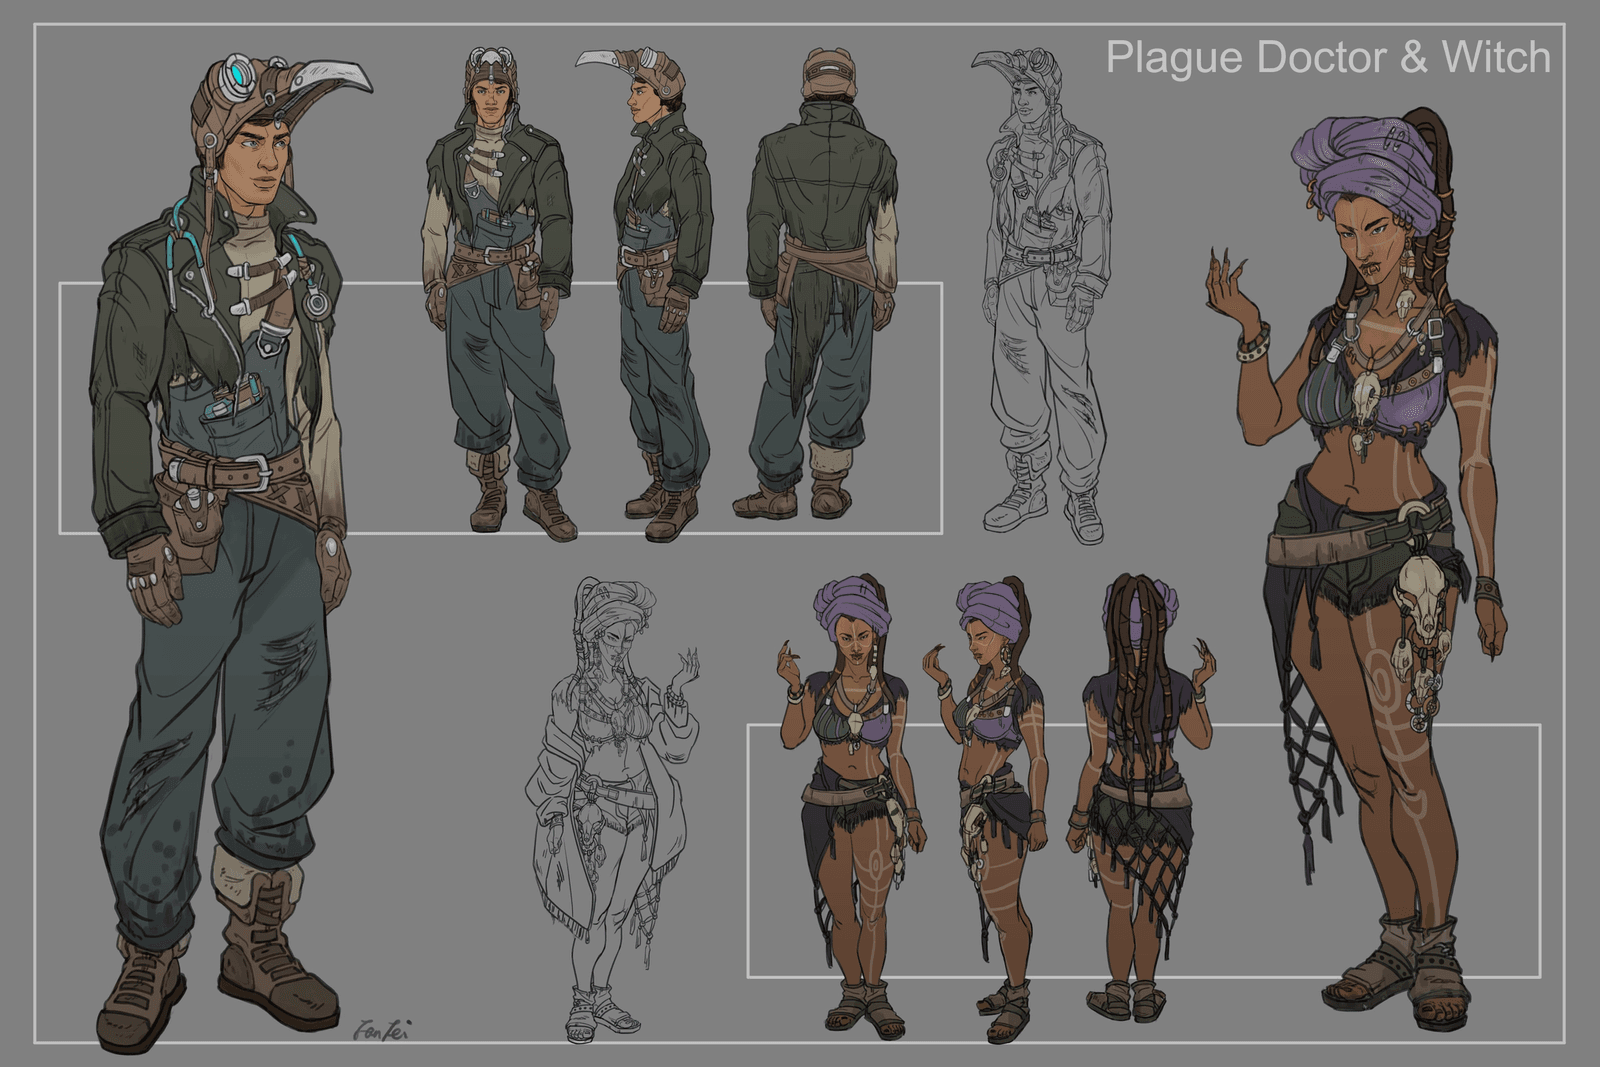 Cowboy Bebop - Plague Doctor & Witch